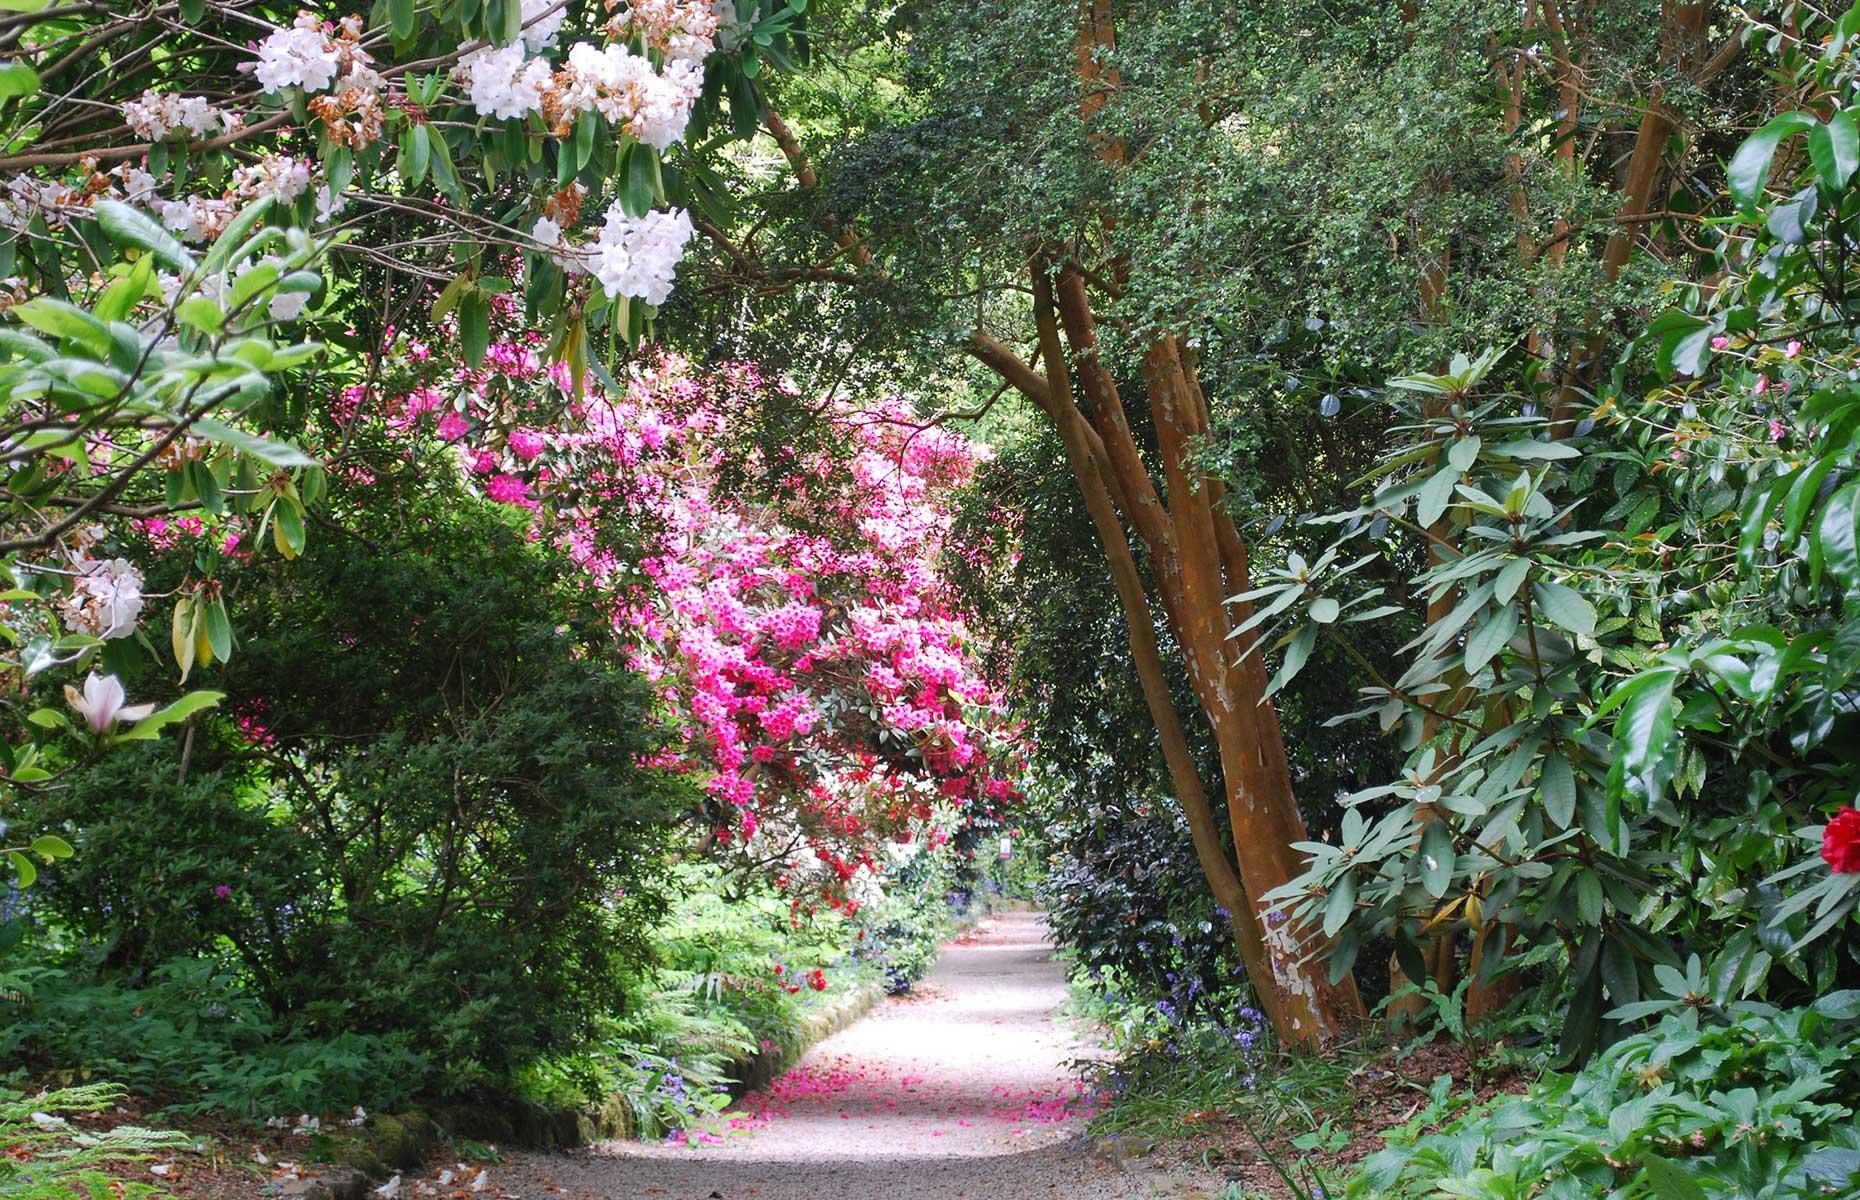 Trengwainton Garden, Cornwall (Image: Martin Stone/Flickr/CC BY-SA 2.0)